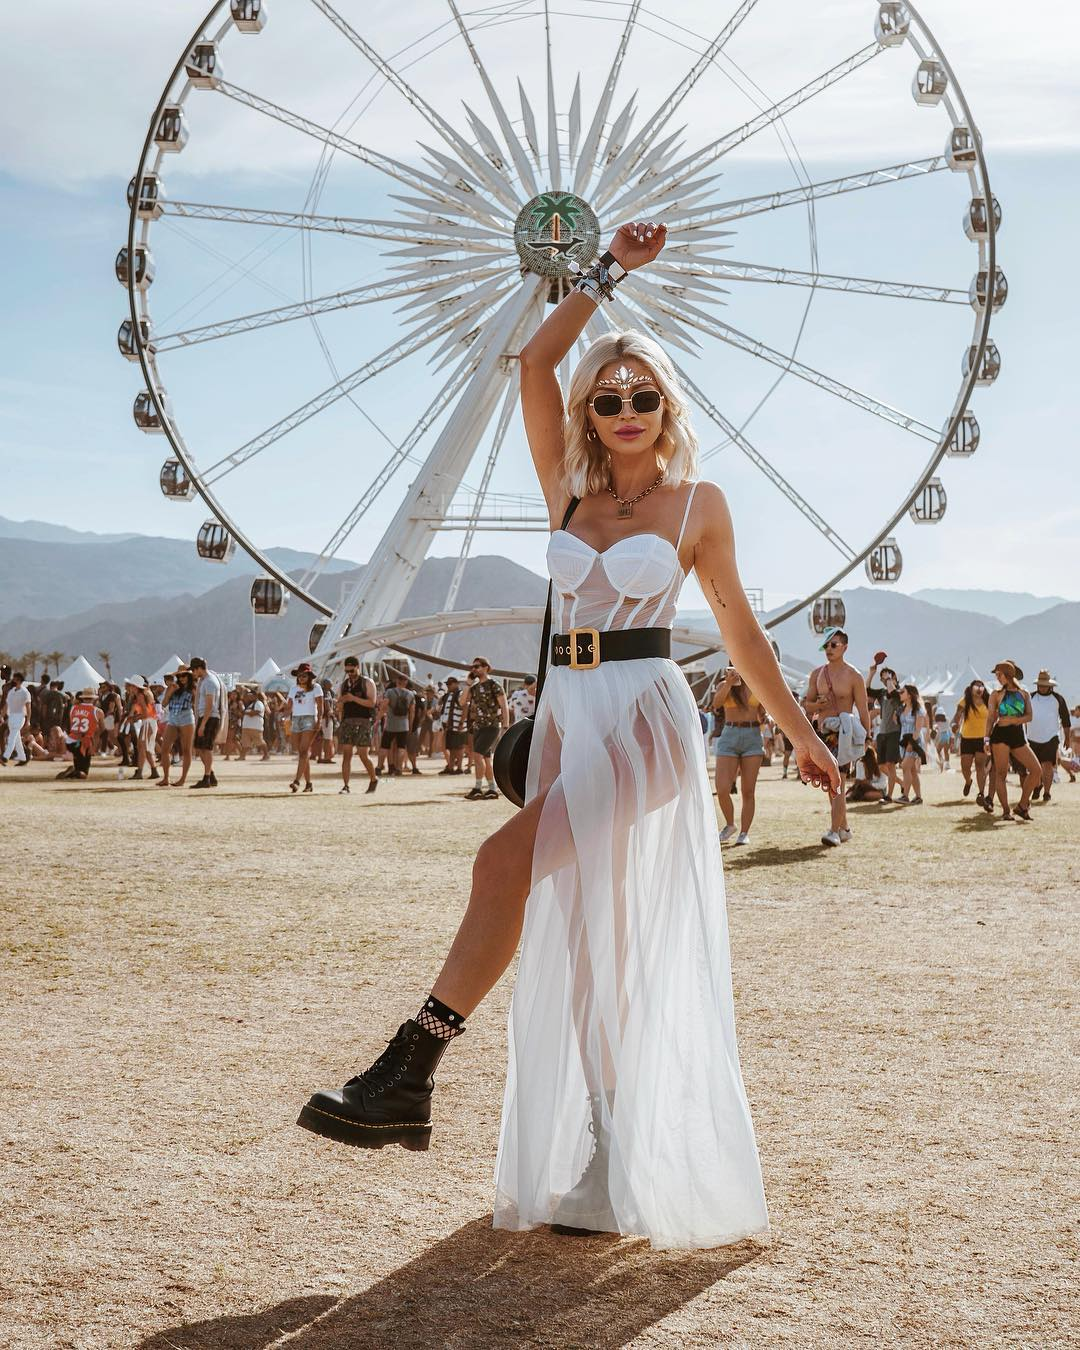 Best Coachella outfits 2019